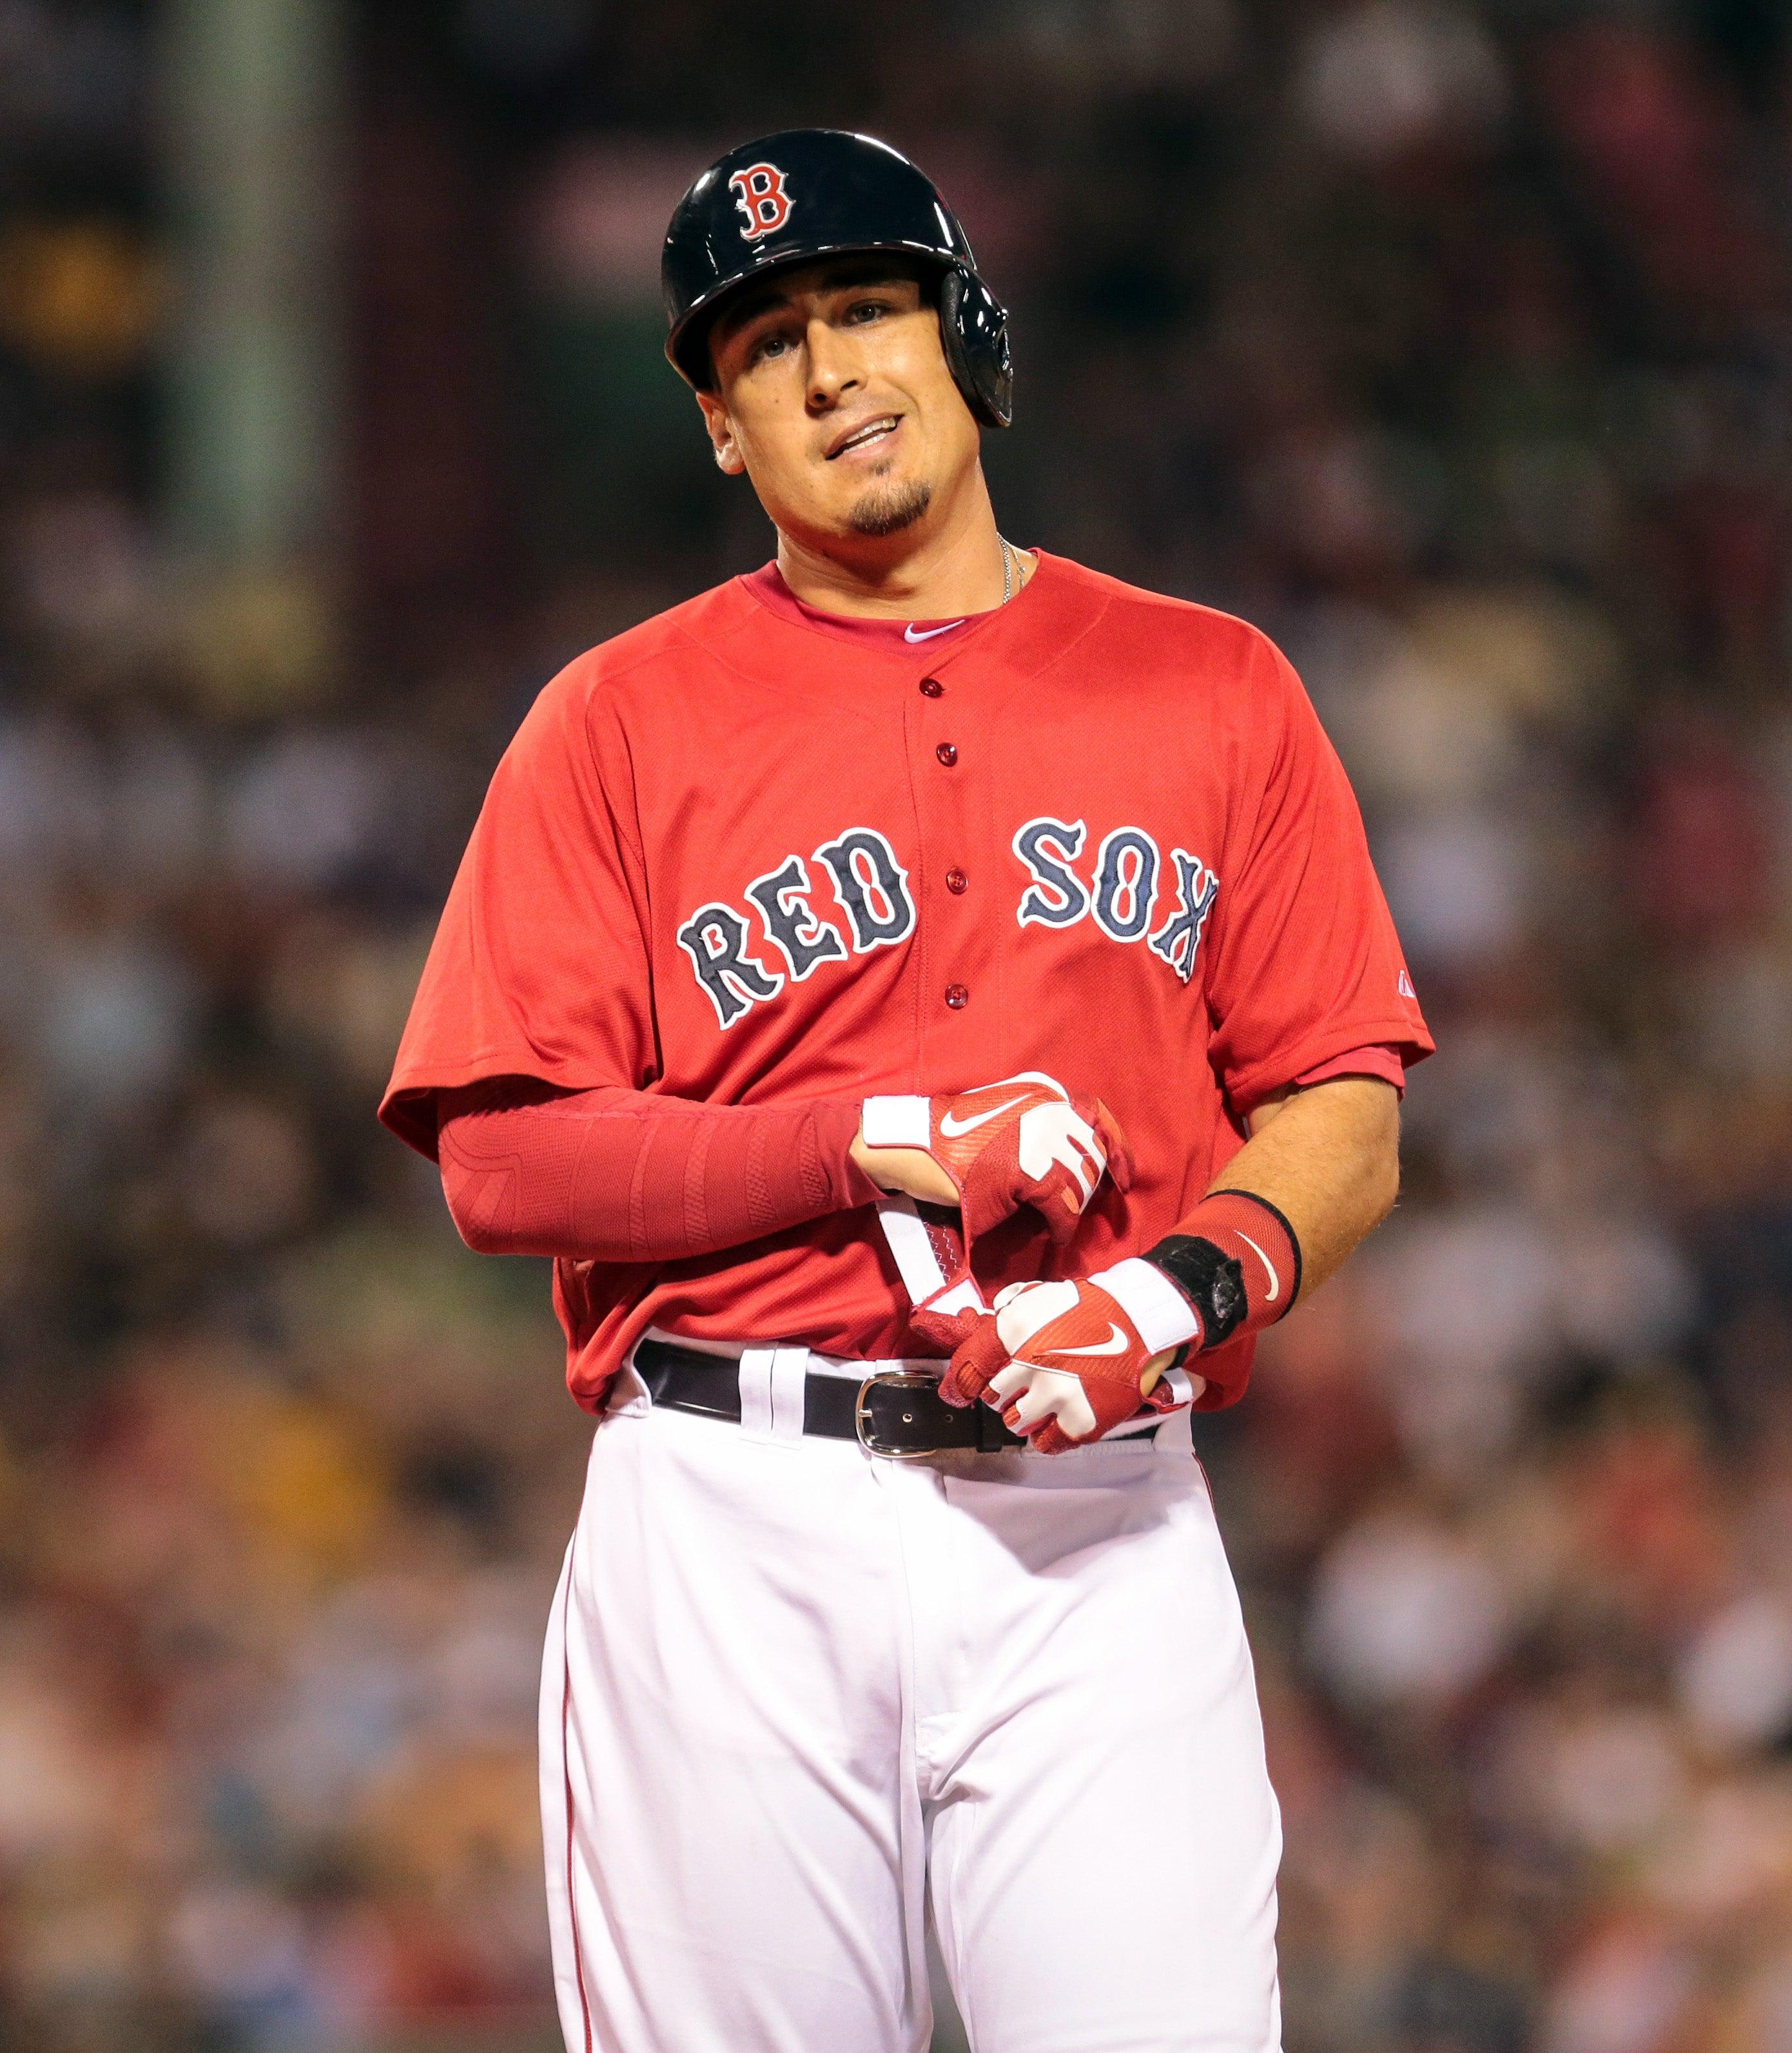 Boghosian_RedSox-Yankees25_SPTS.jpg